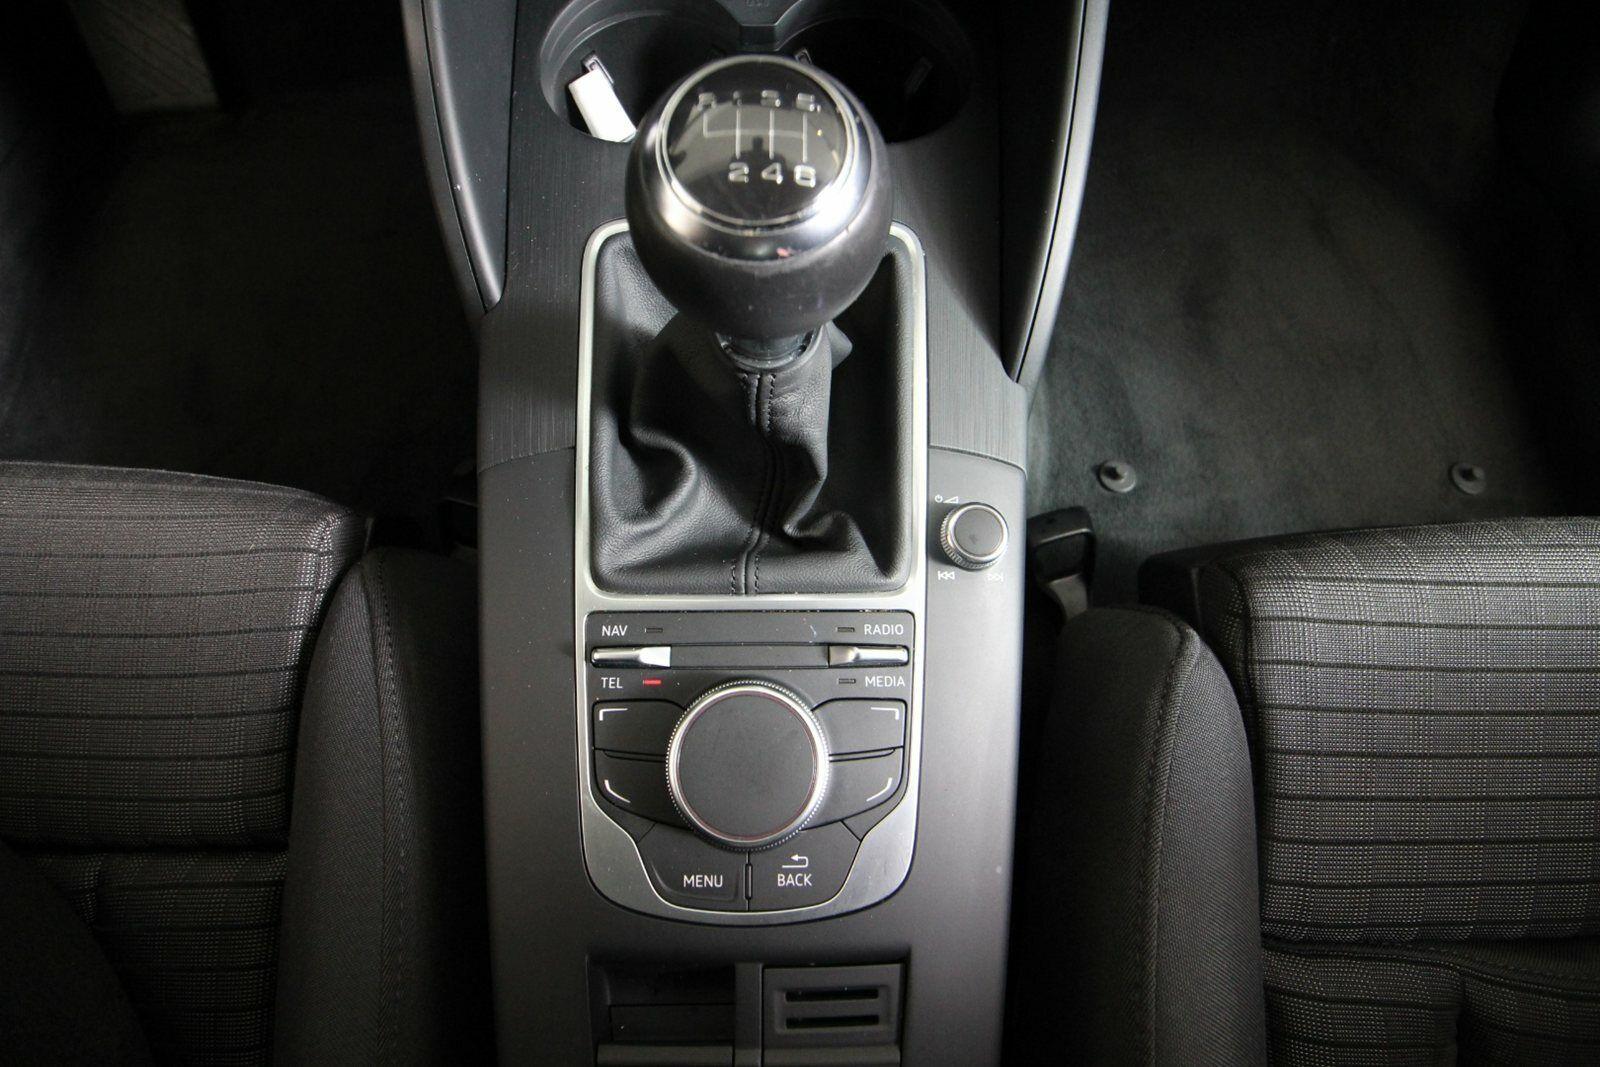 Audi A3 TFSi 150 Ambition SB